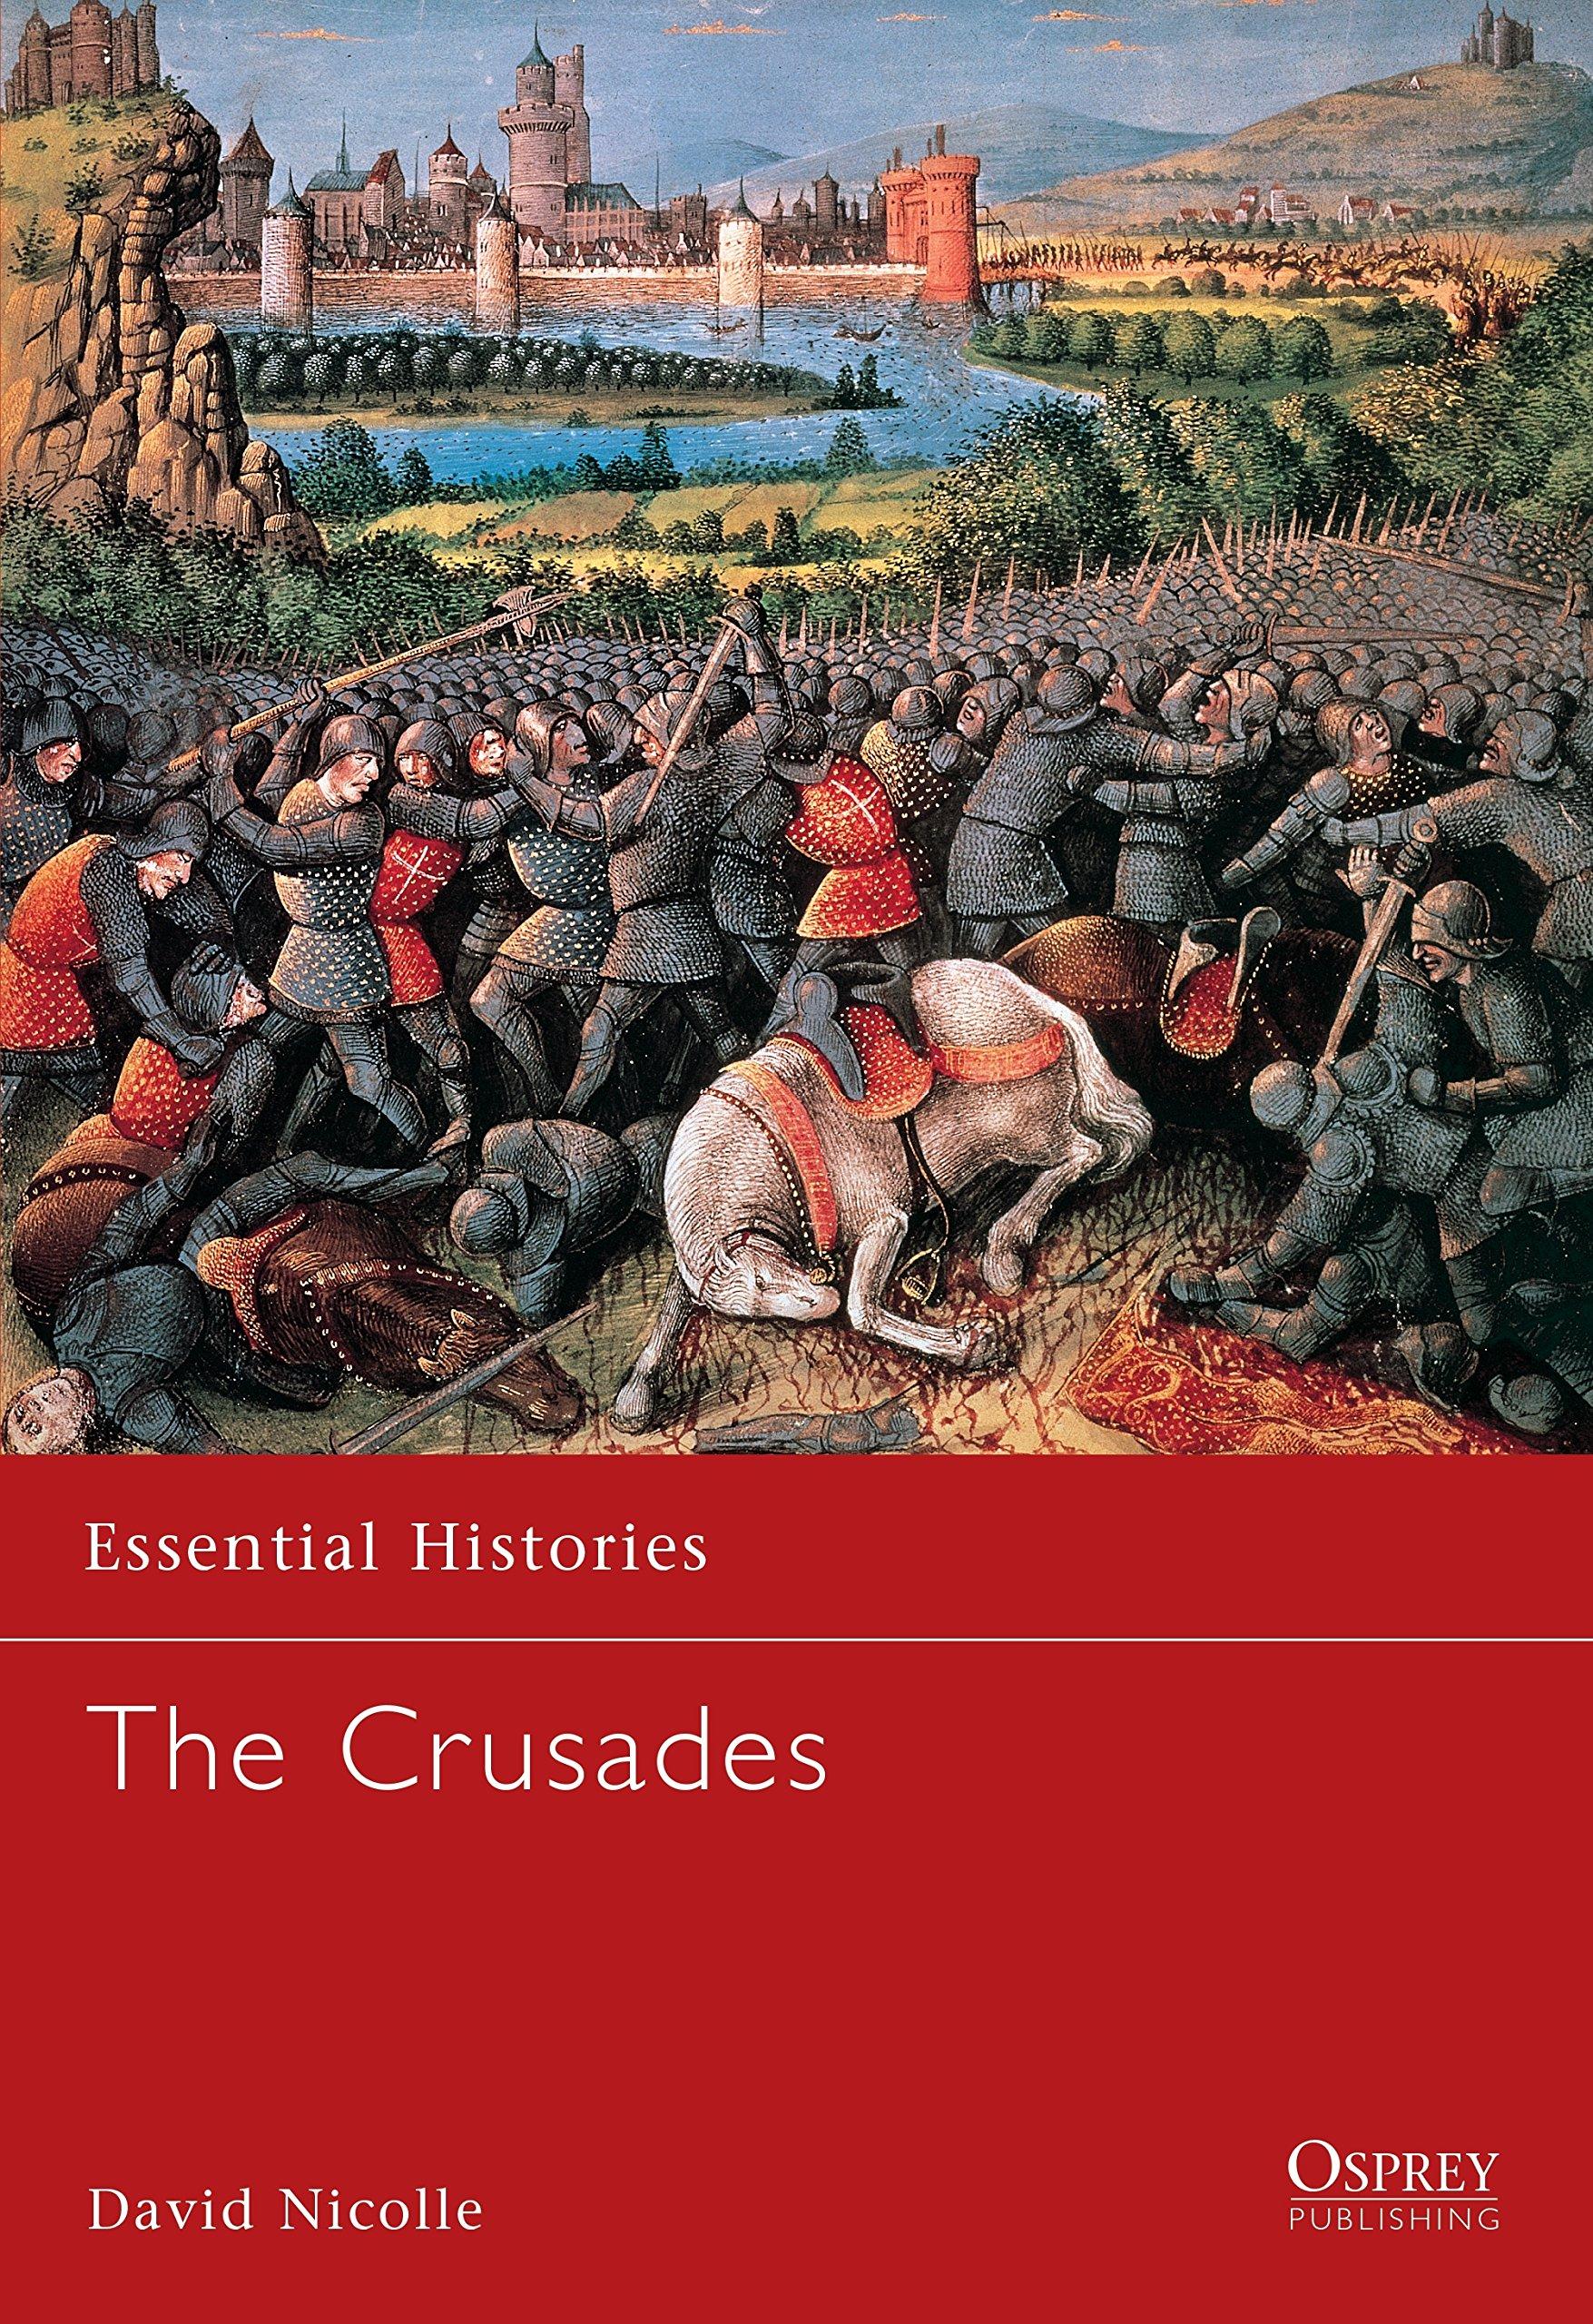 The Crusades (Osprey Essential Histories, Volume 1)